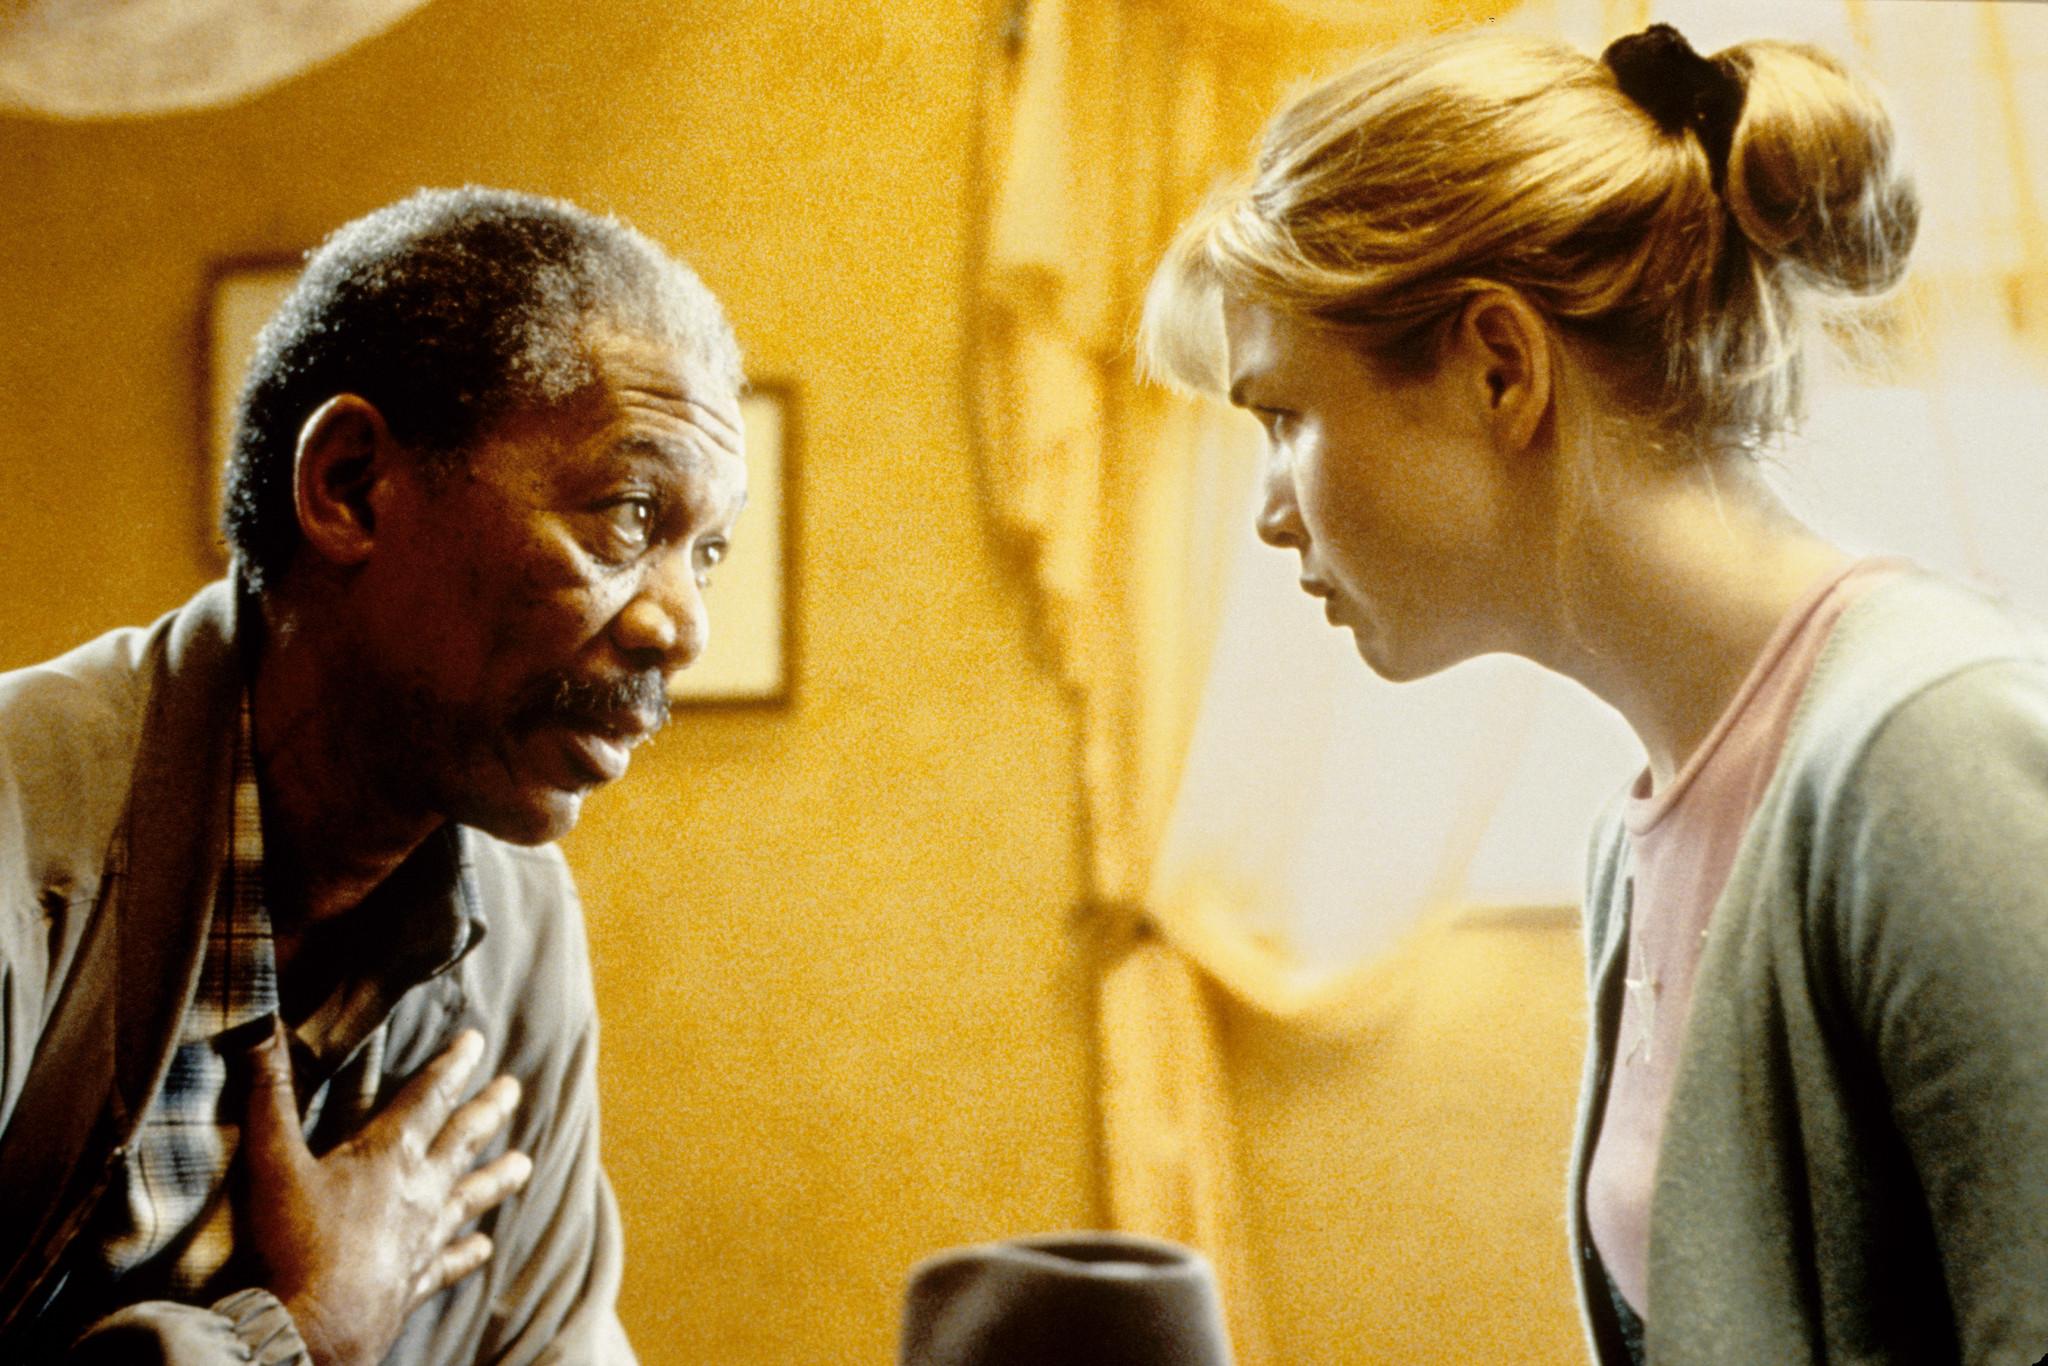 Morgan Freeman and Renée Zellweger in Nurse Betty (2000)